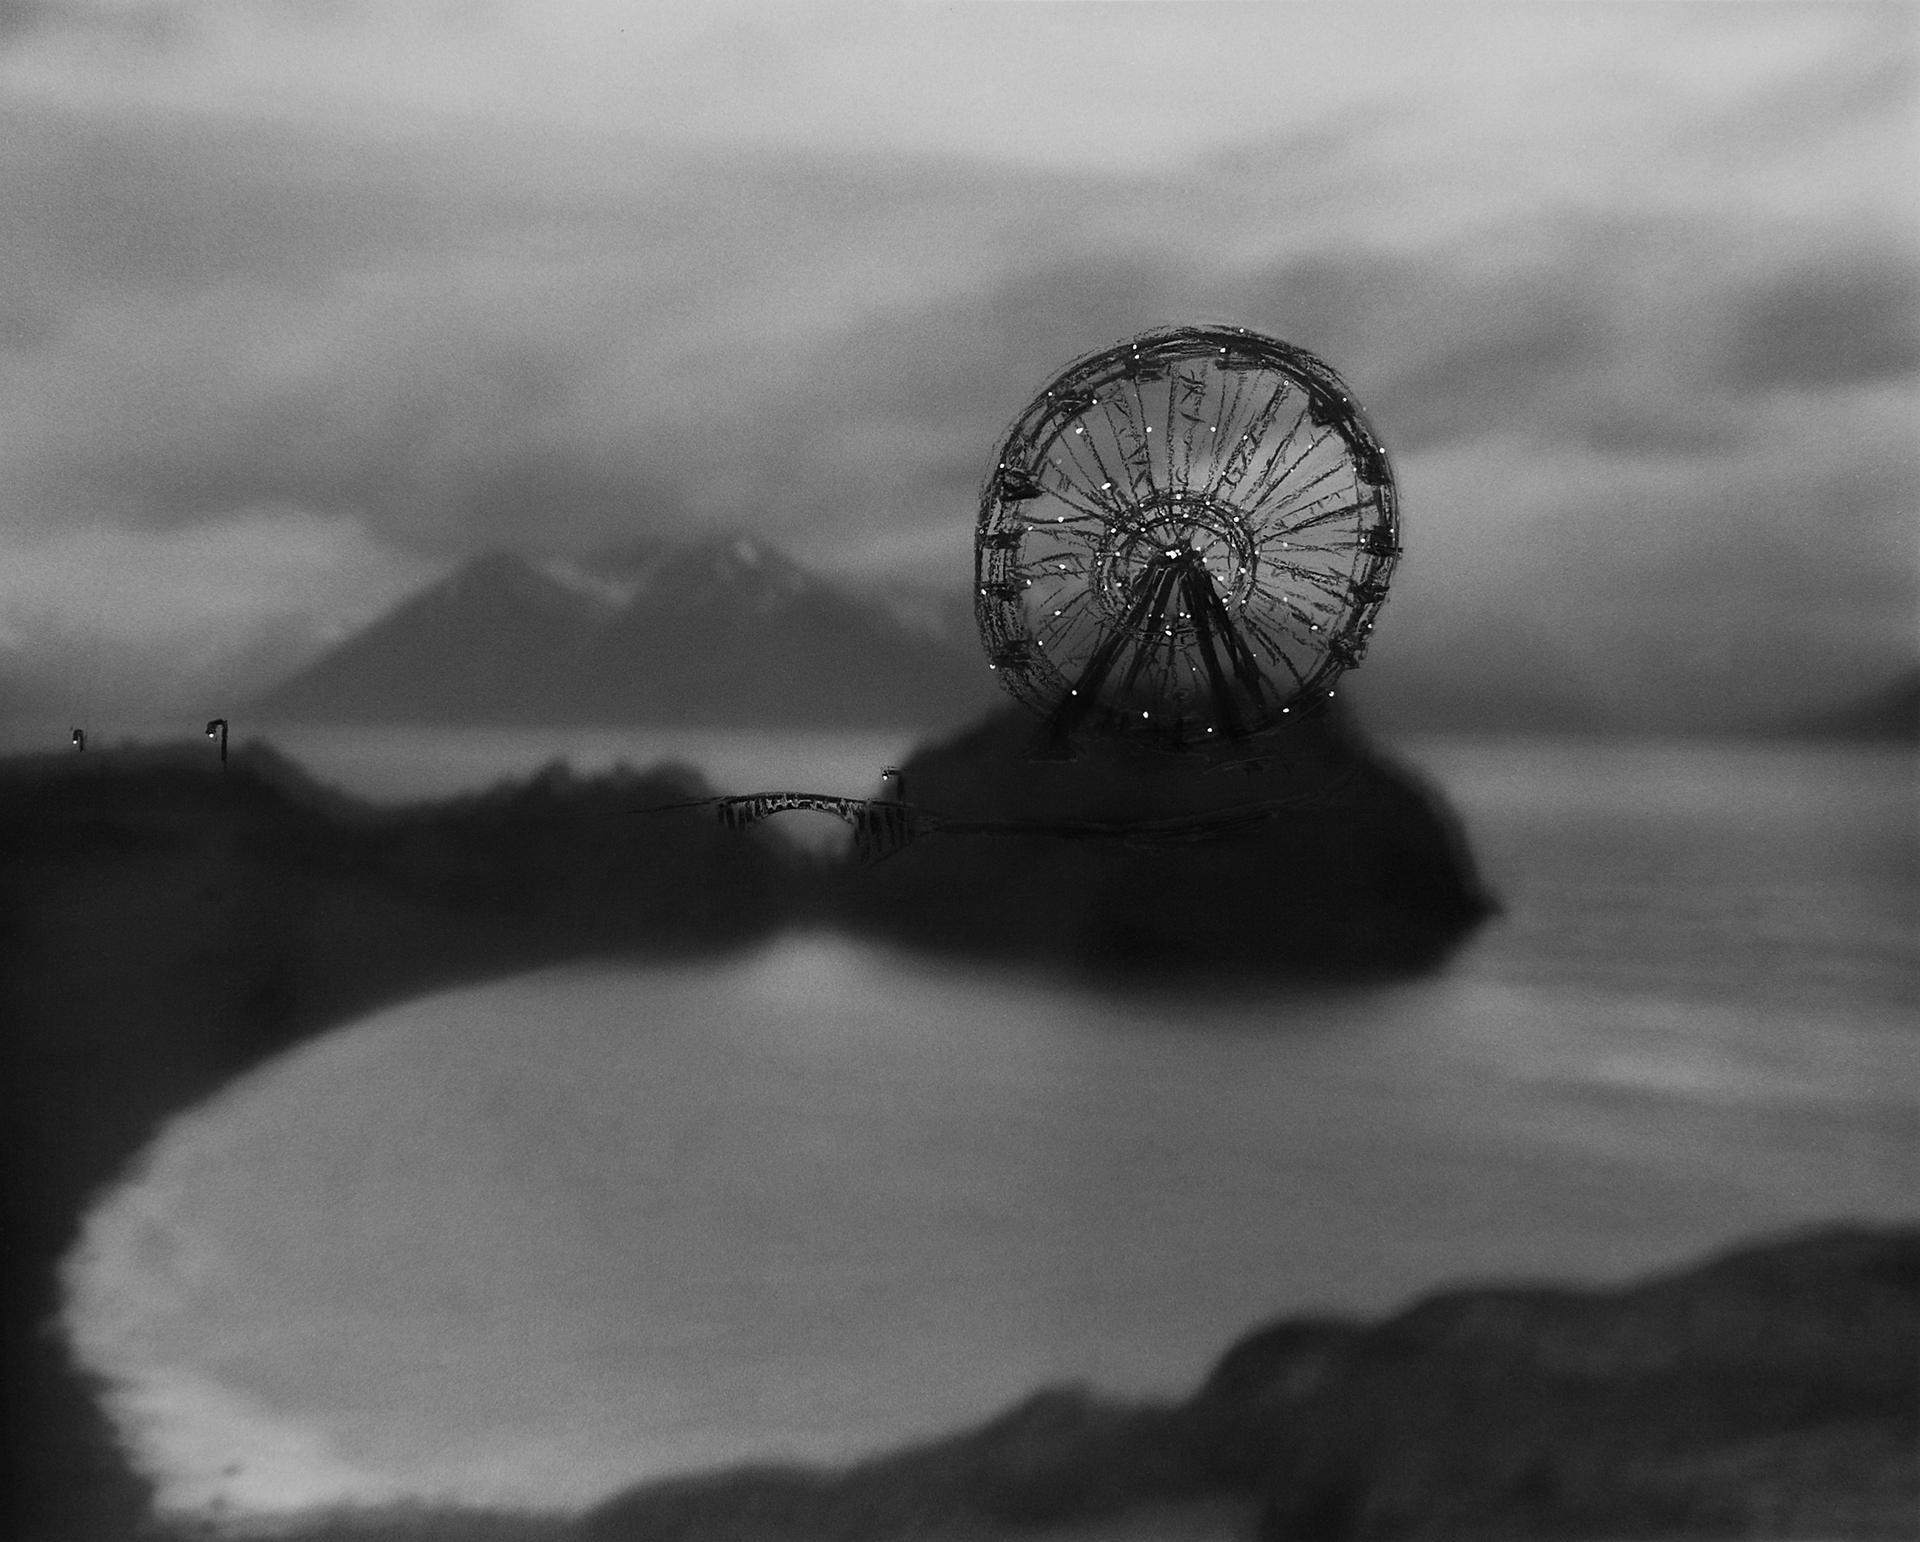 Swanson, Cody Beluga Point Ferris Wheel Second Place